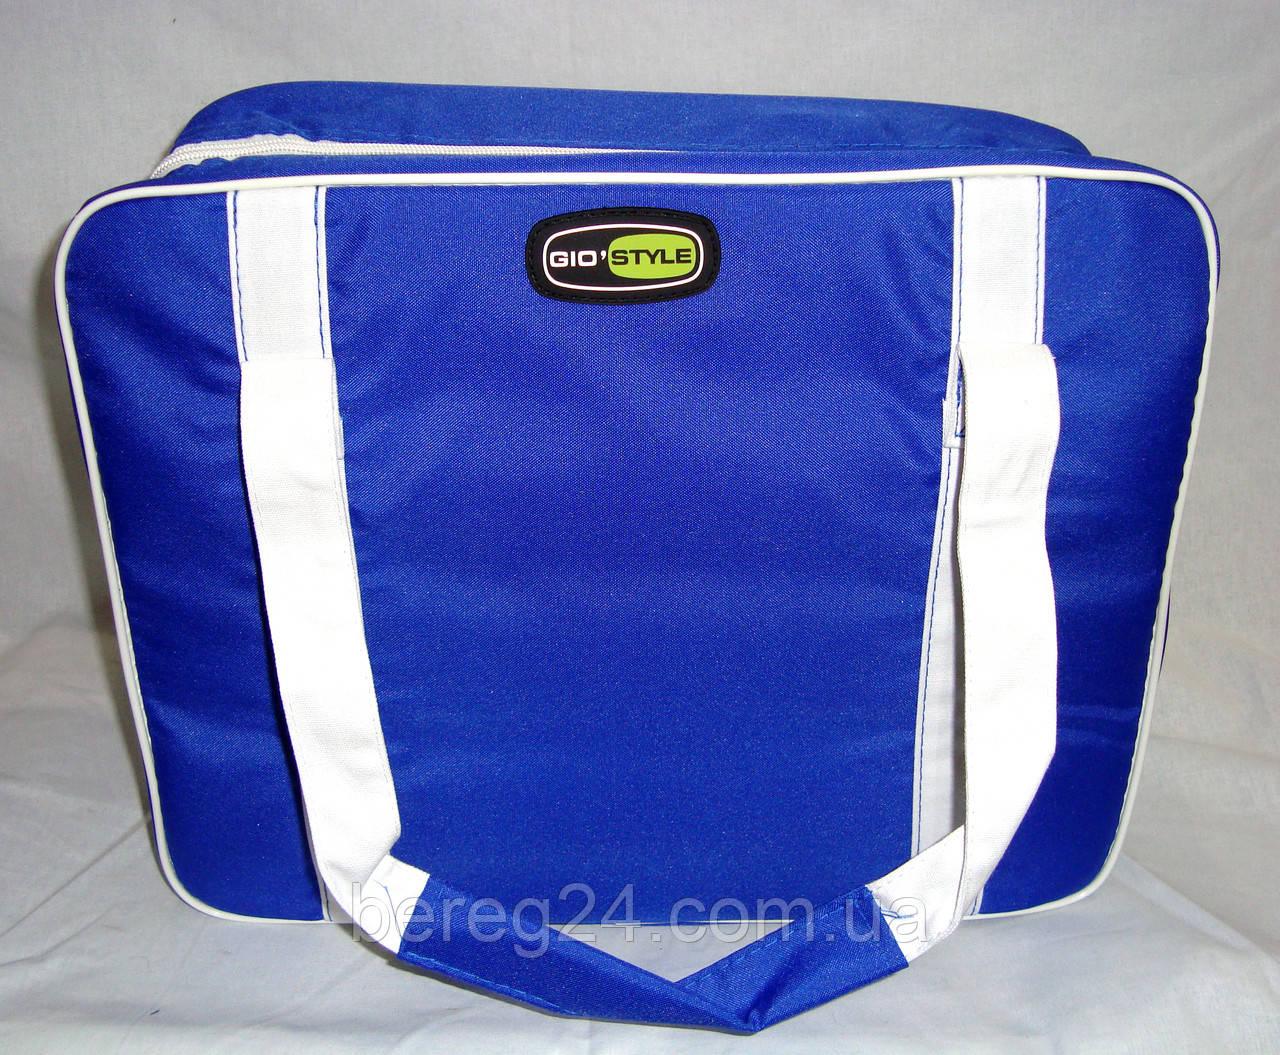 Термосумка (сумка-холодильник) Кемпінг Giostyle Evo Basic Medium 23 л ізотермічна сумка